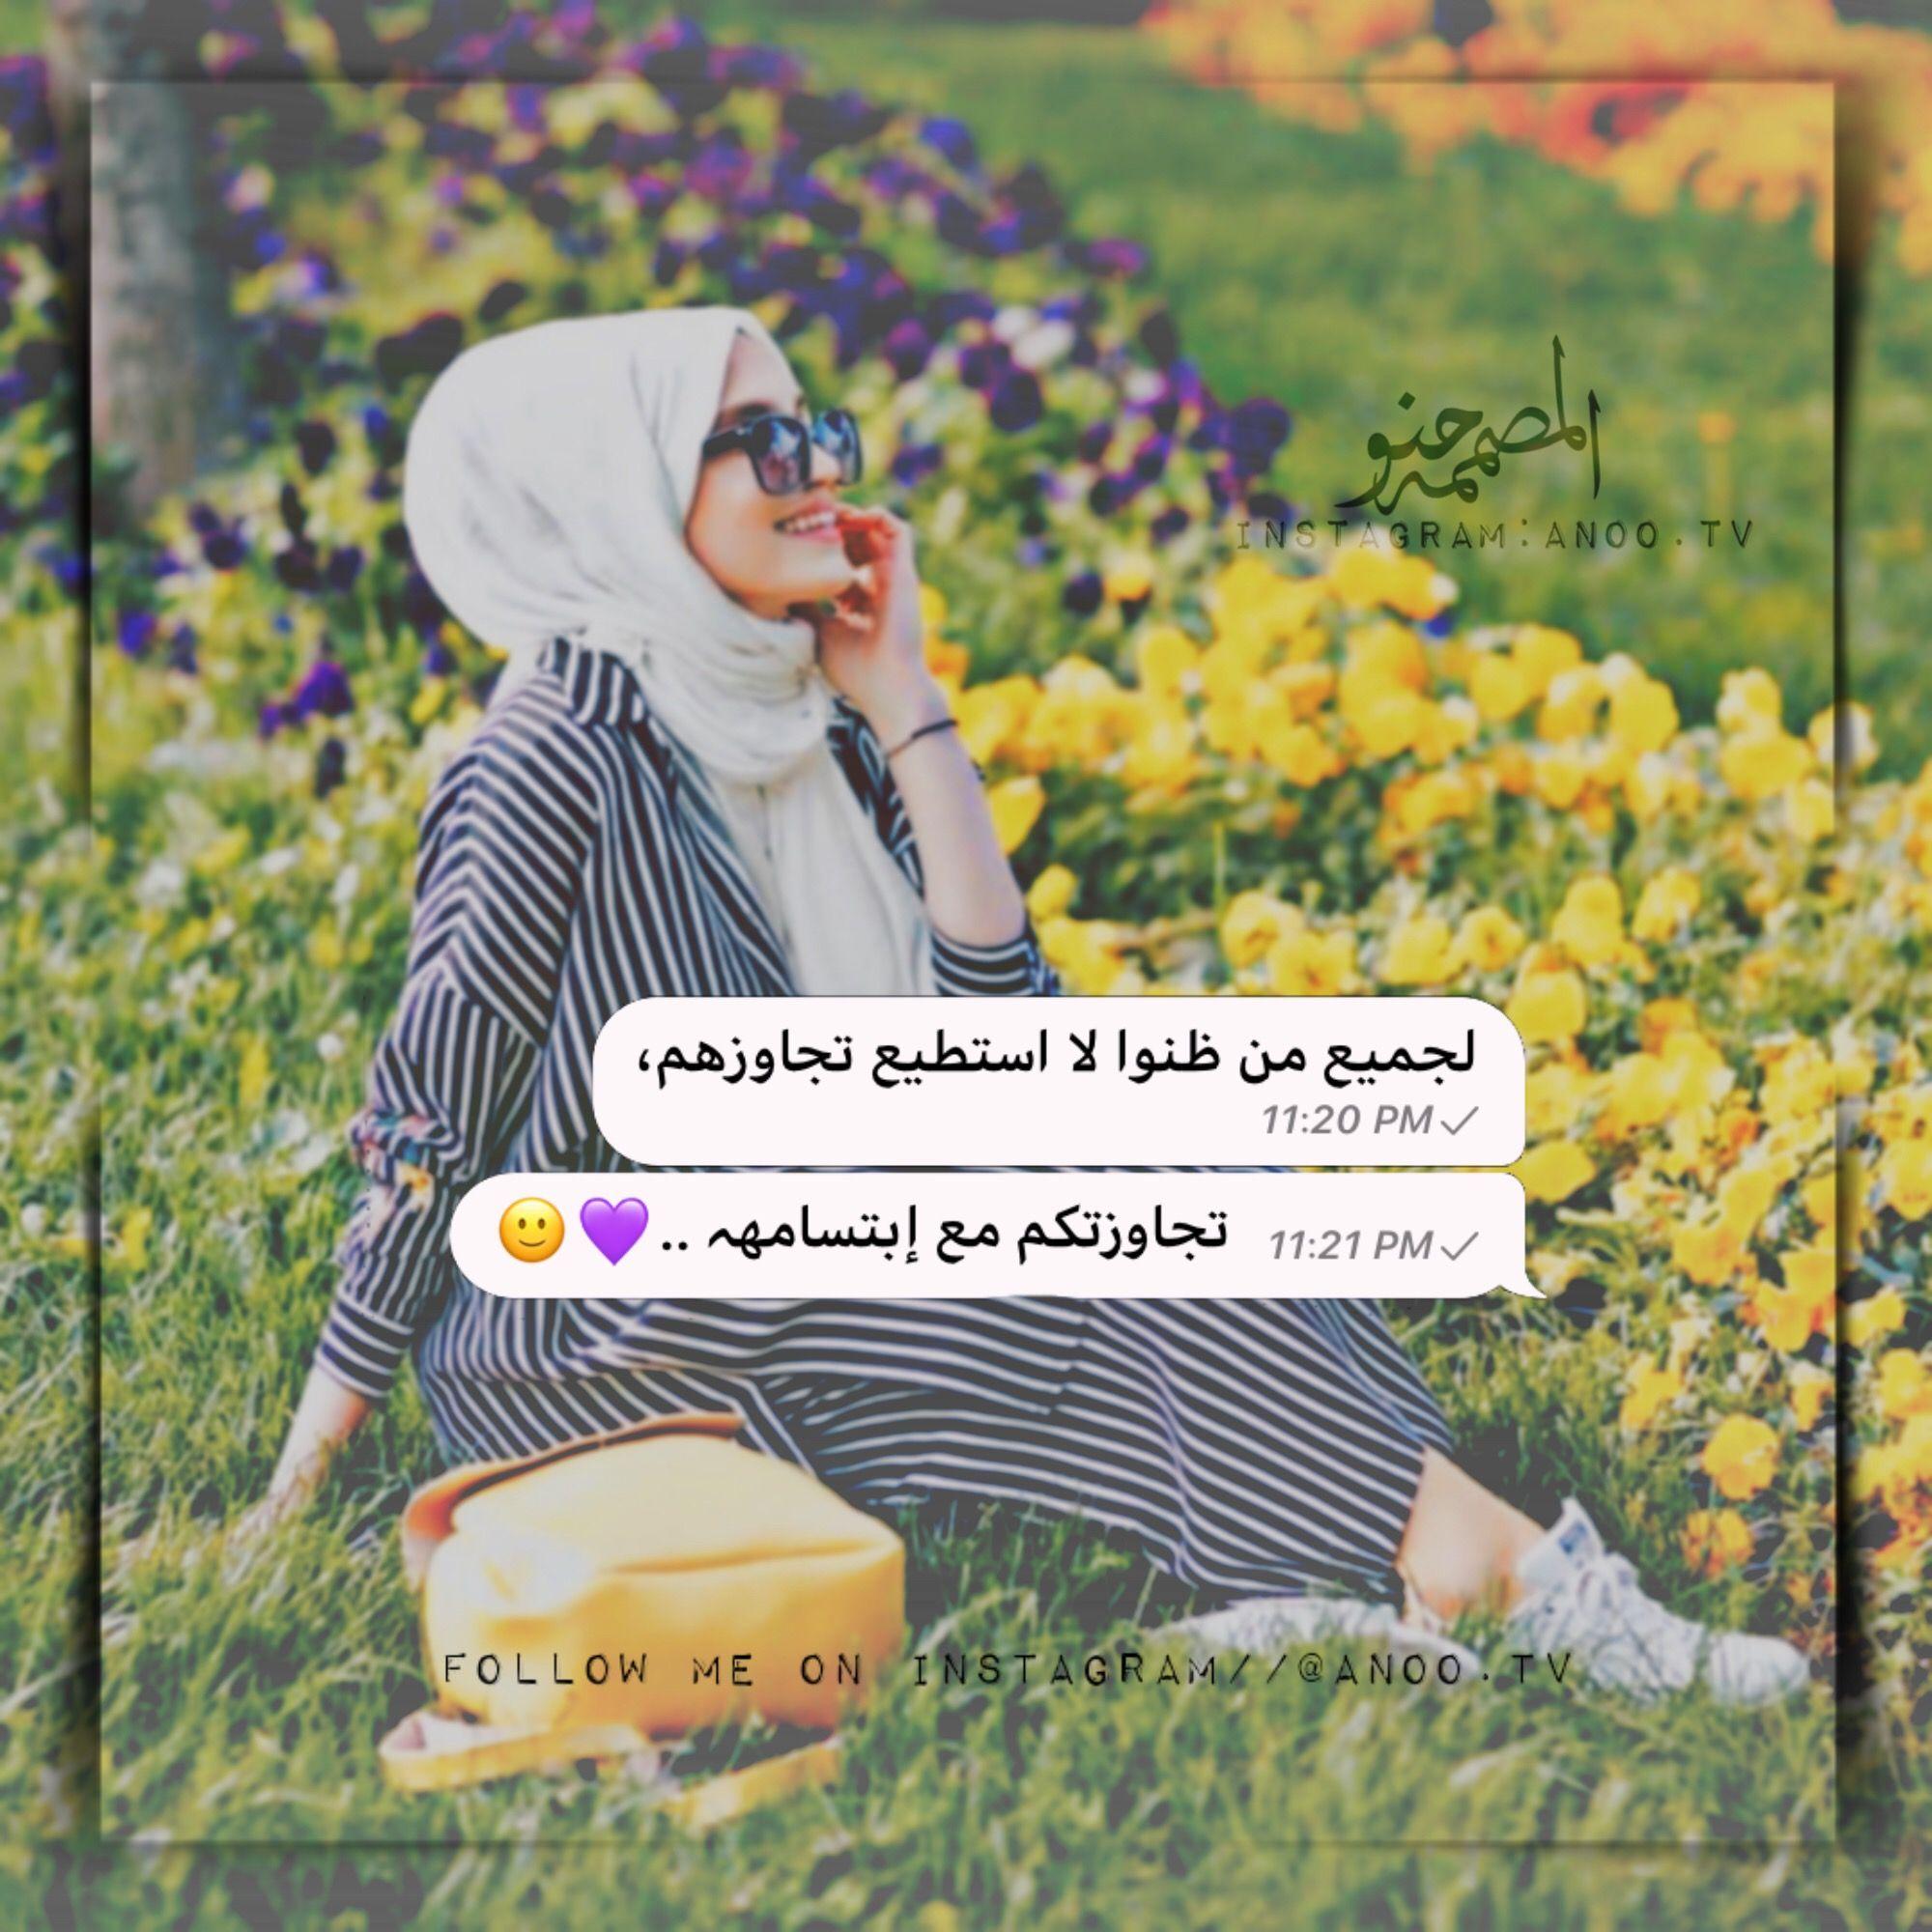 اكسبلور فولو ي حلو رئيكم يهمني تصاميمي تصاميم عراقية تصاميم خليجية تصاميمي Movie Quotes Funny Anime Art Girl Stylish Girl Images